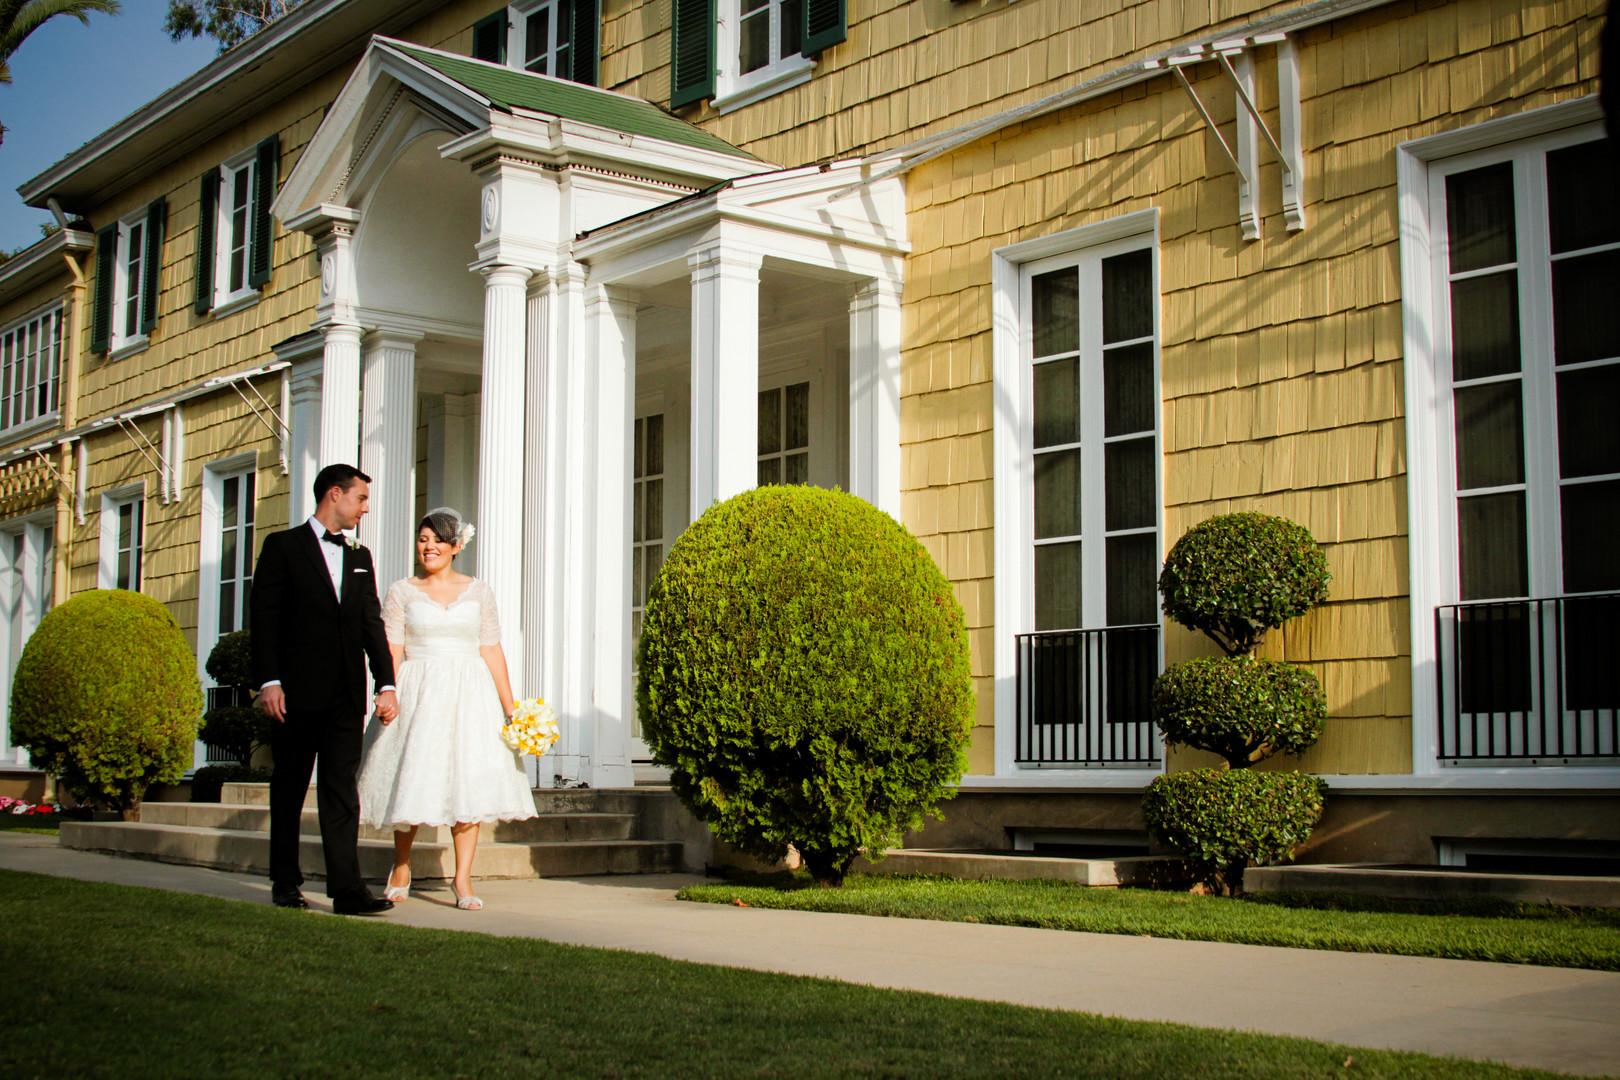 Lindley Scott House Wedding, Azusa Wedding Photographer, Vintage Wedding, Los Angeles Wedding Venue, Bride and Groom